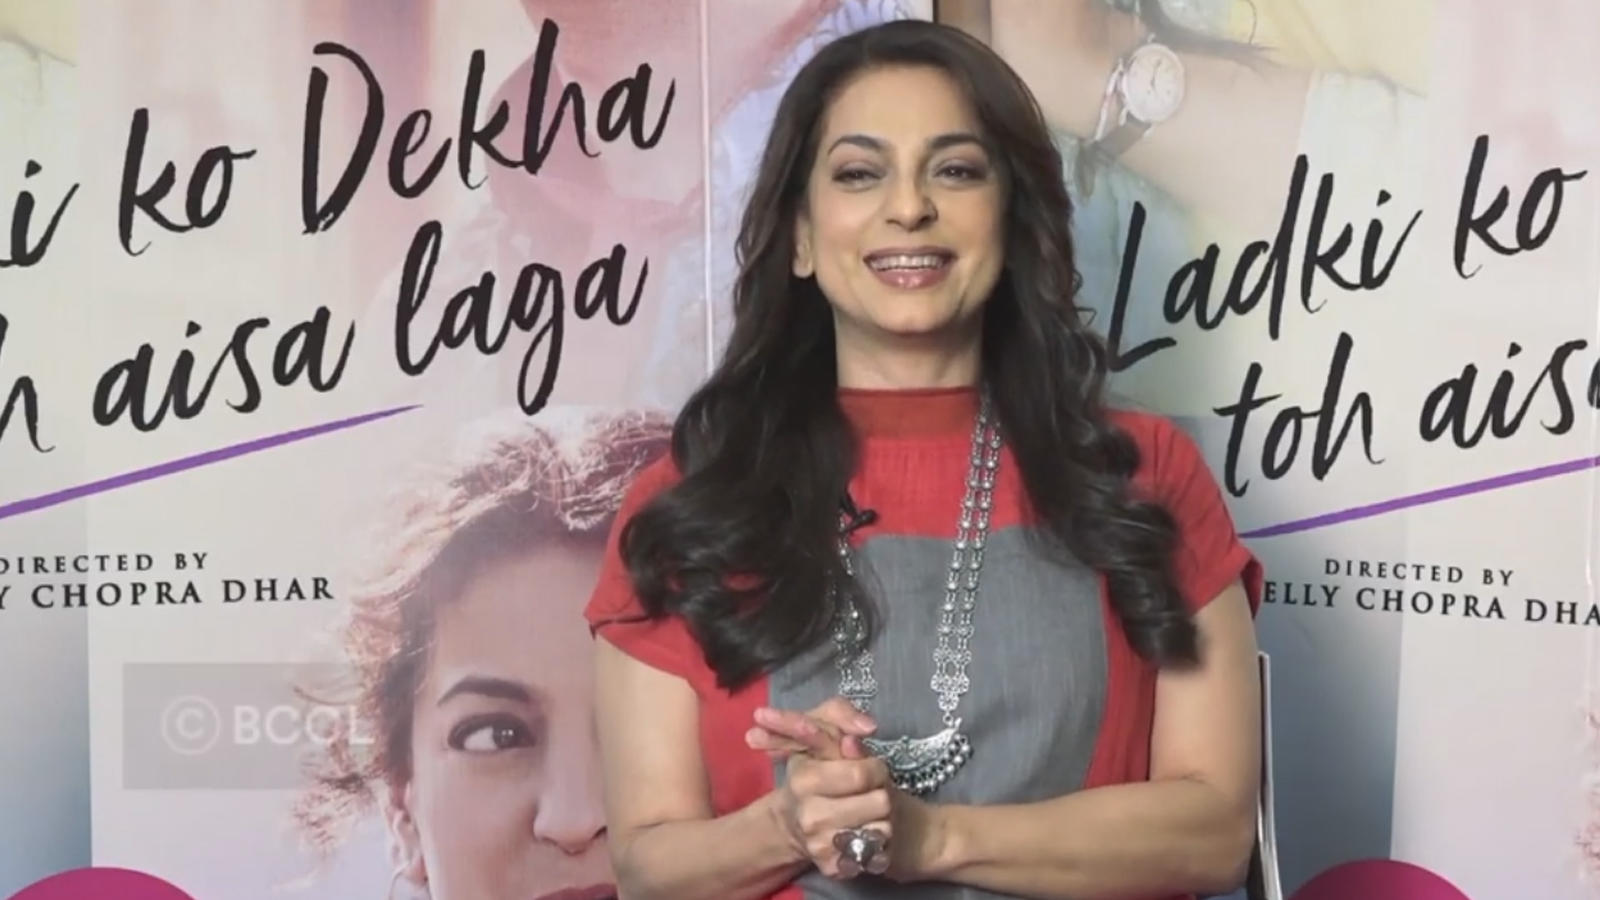 Ek Ladki Ko Dekha Toh Aisa Laga: Juhi Chawla translates Bollywood dialogues in Punjabi